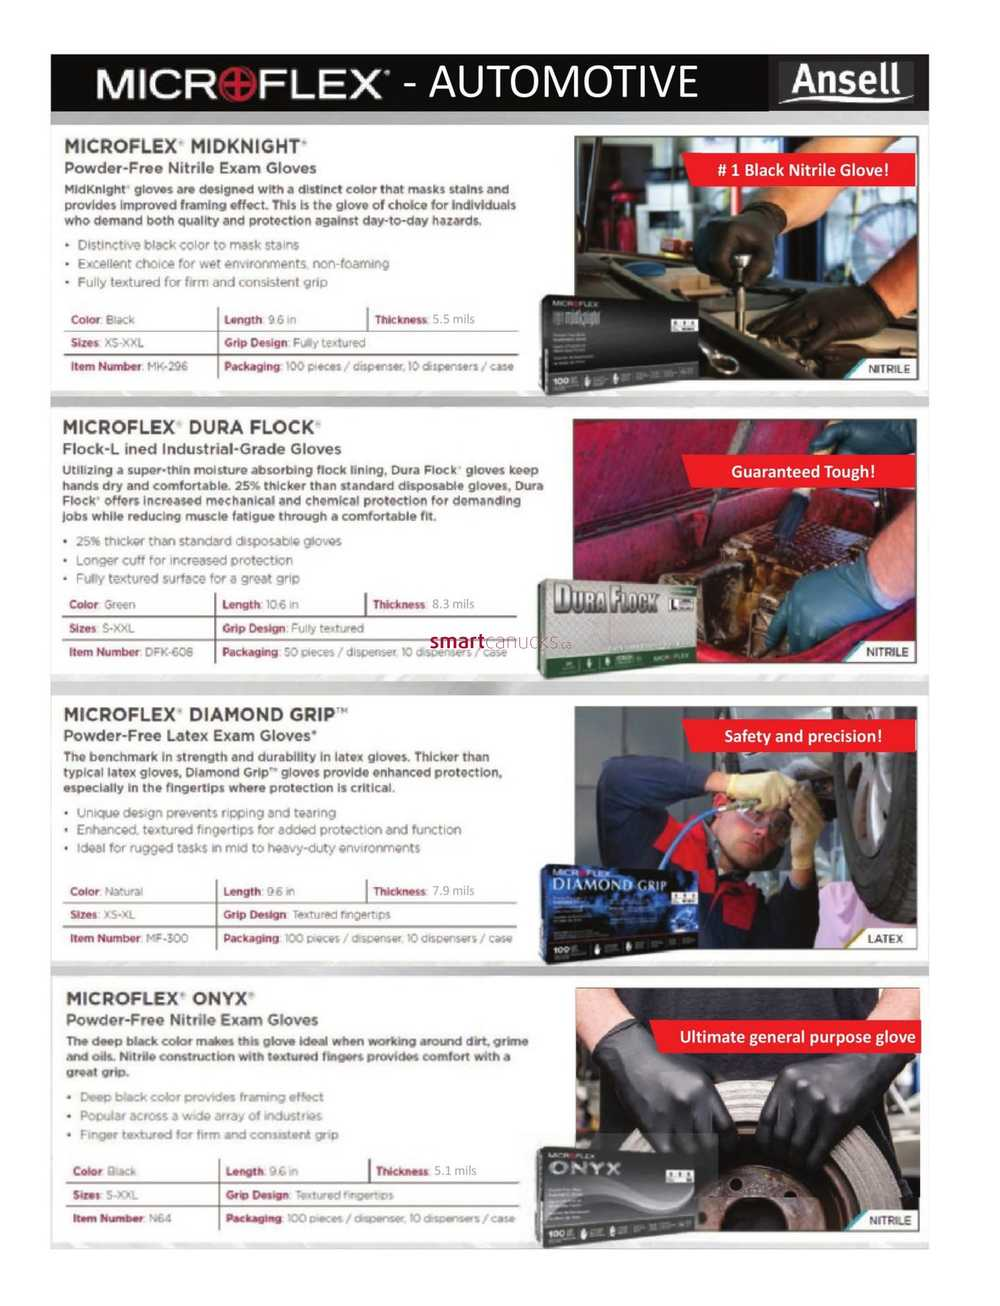 NAPA Auto Parts Real Deals Catalogue September 1 to October 31